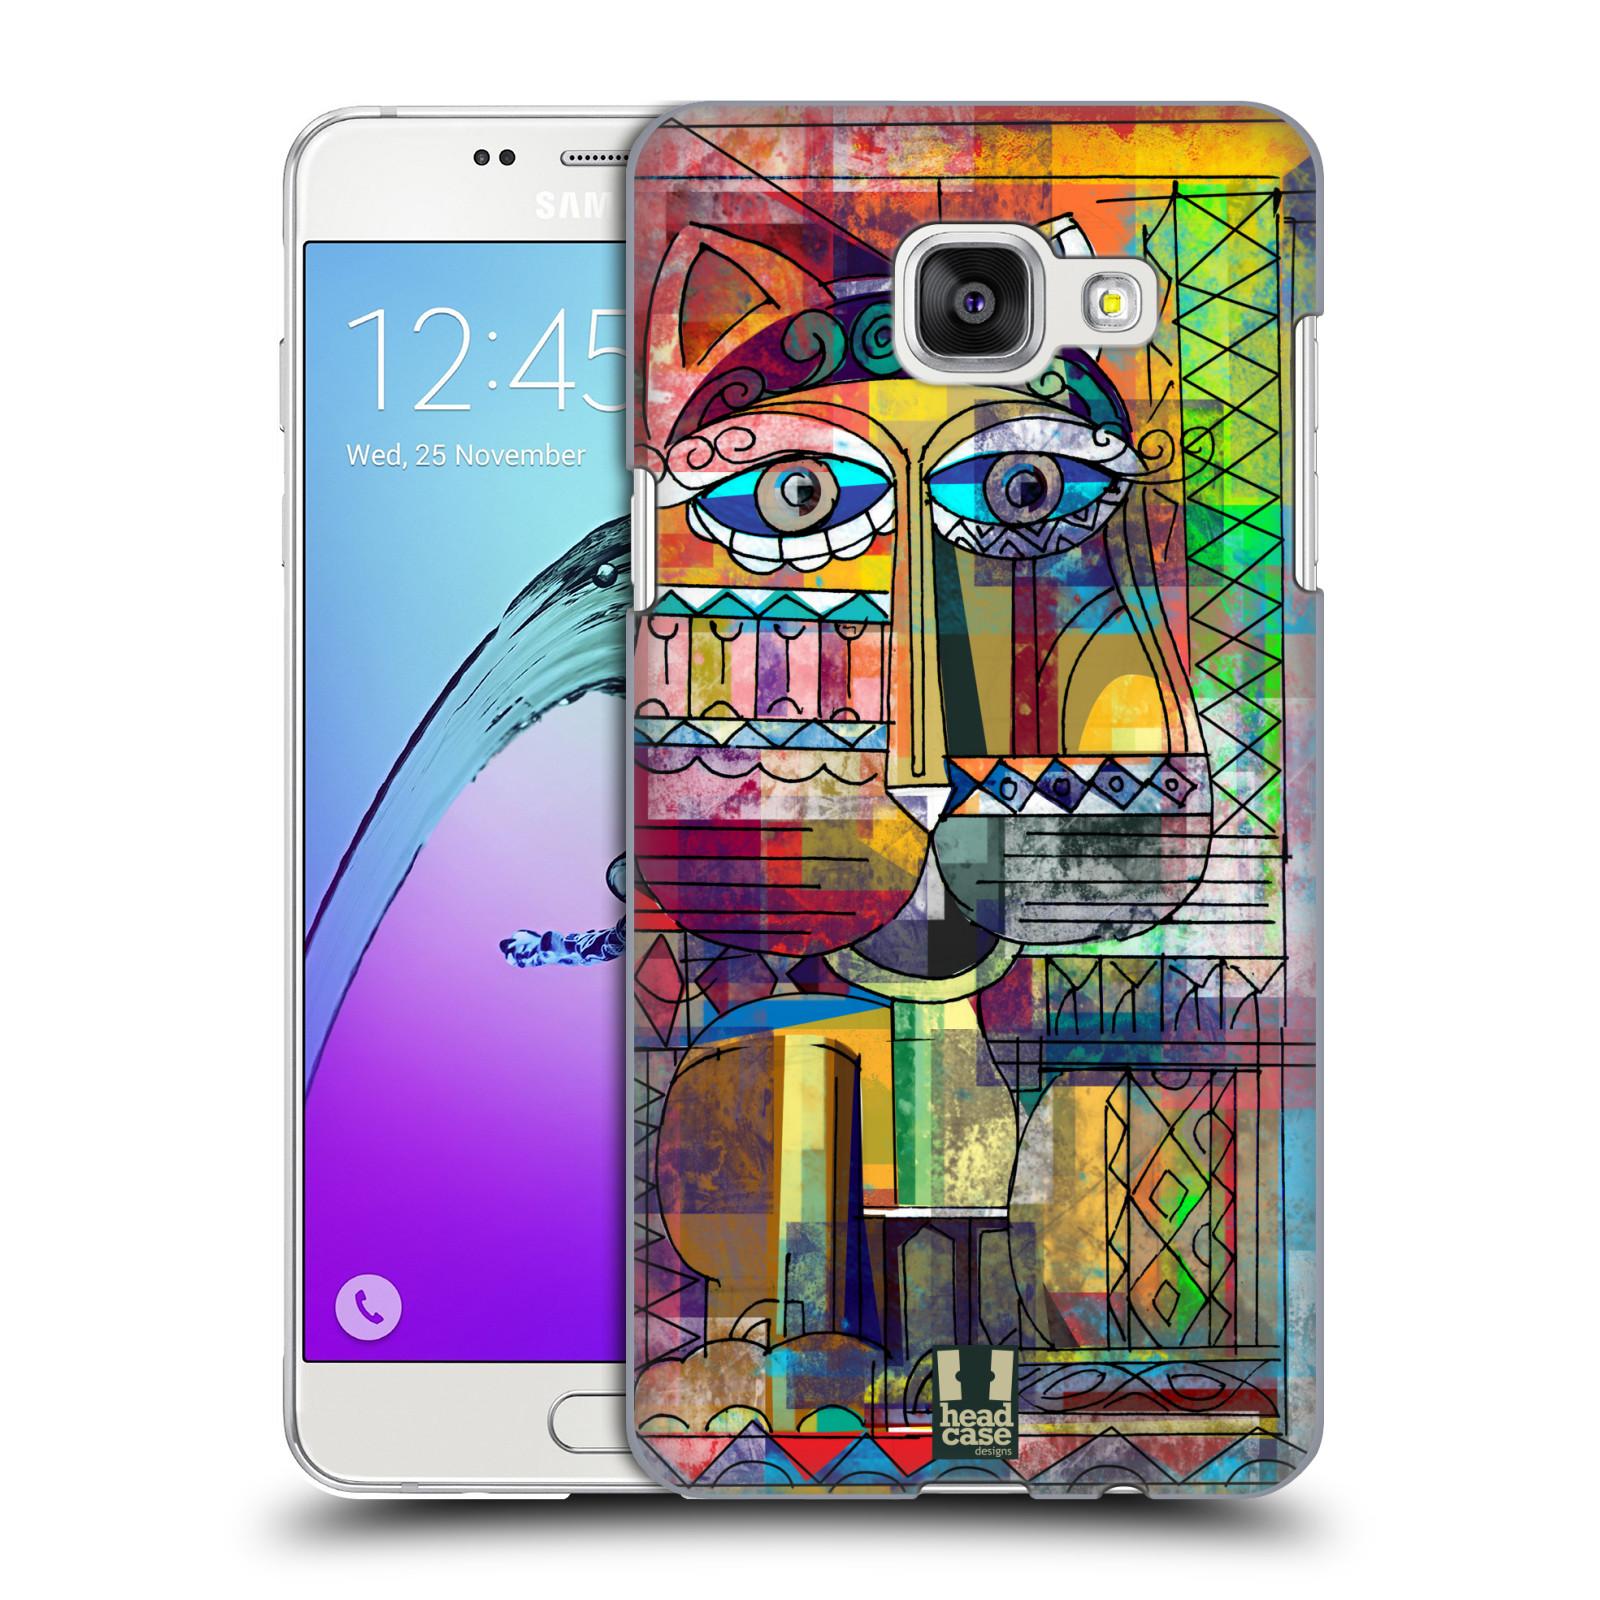 Plastové pouzdro na mobil Samsung Galaxy A5 (2016) HEAD CASE AZTEC KORAT